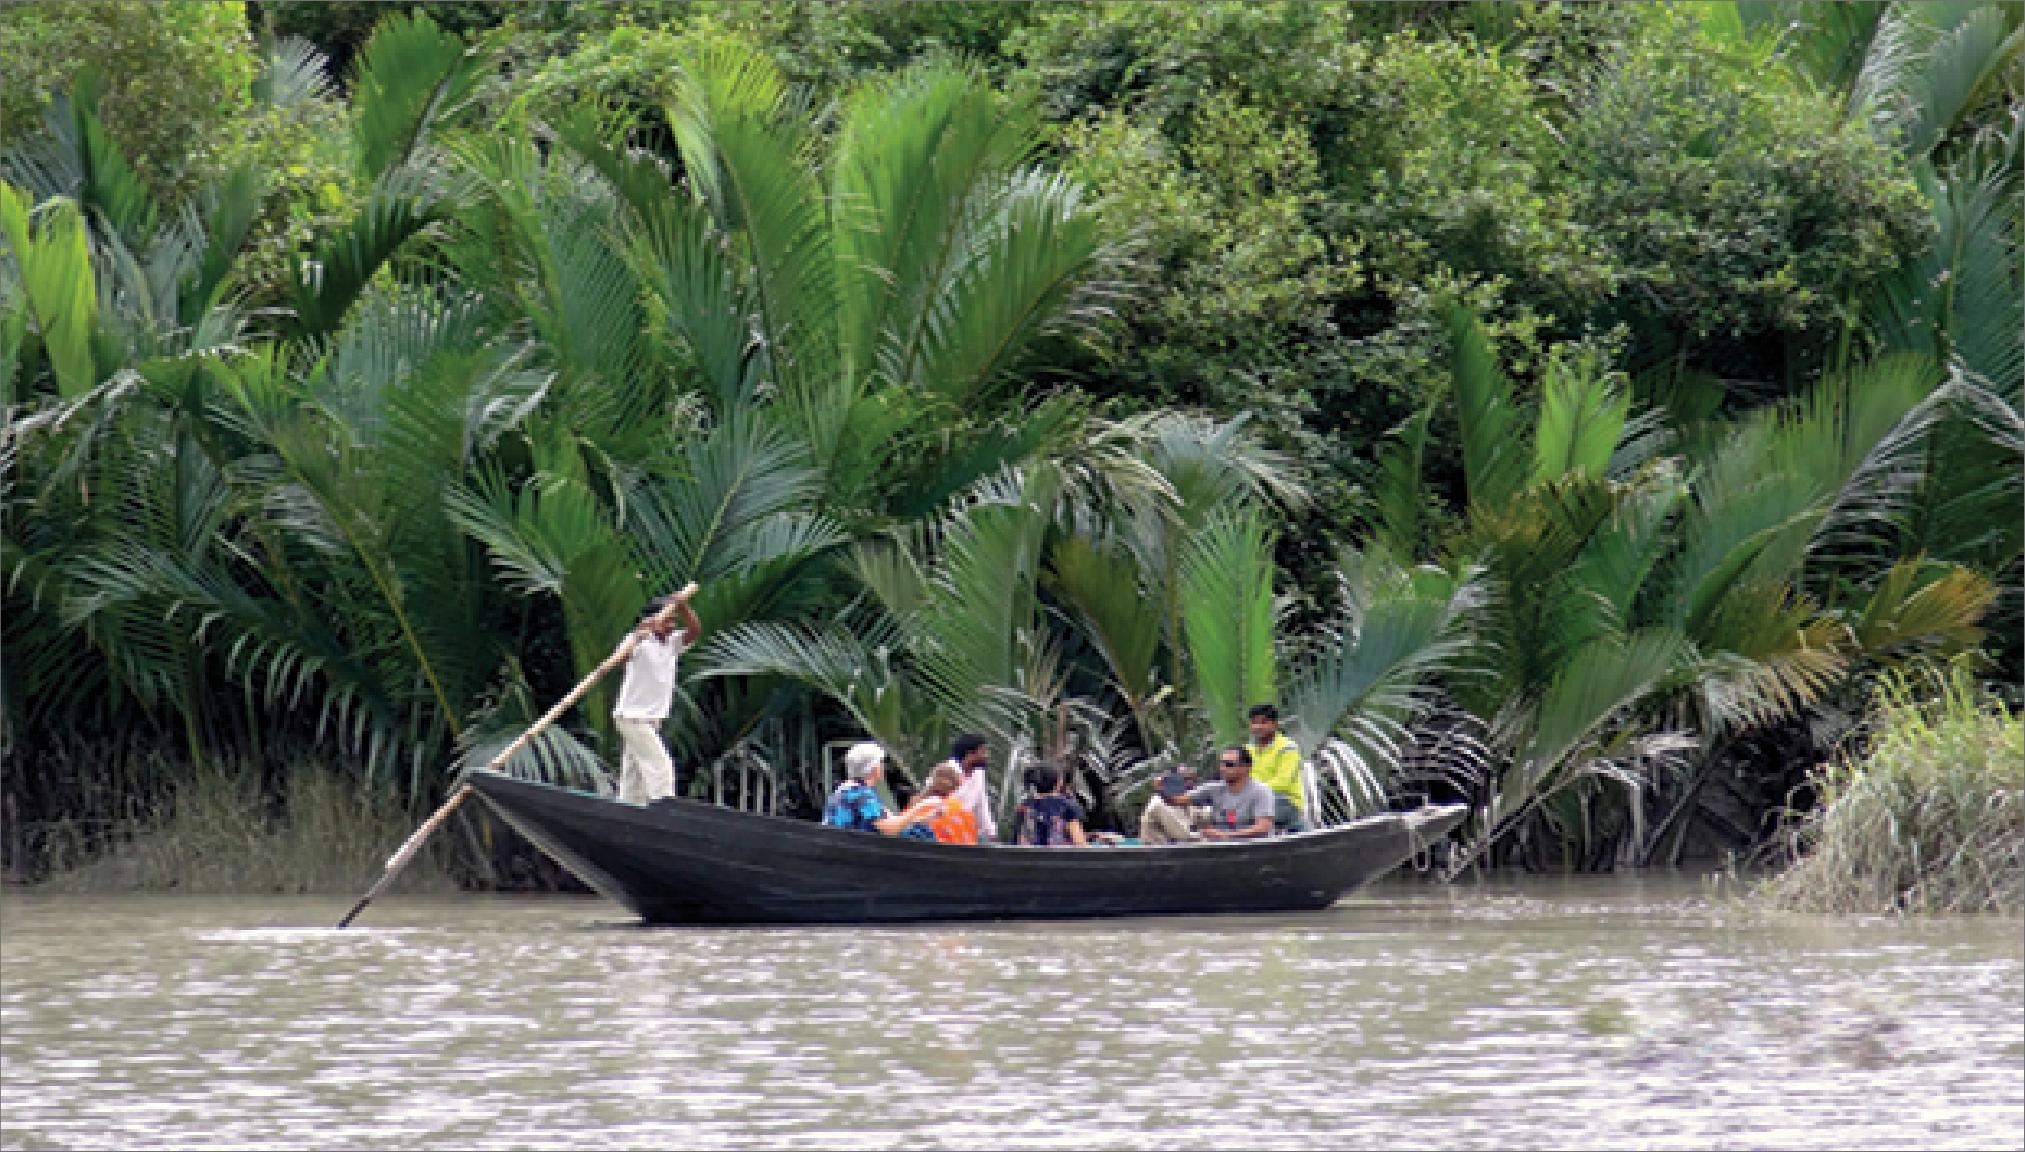 Sundarbans: An Alternative<br><h6><small>5 days / 4 nights